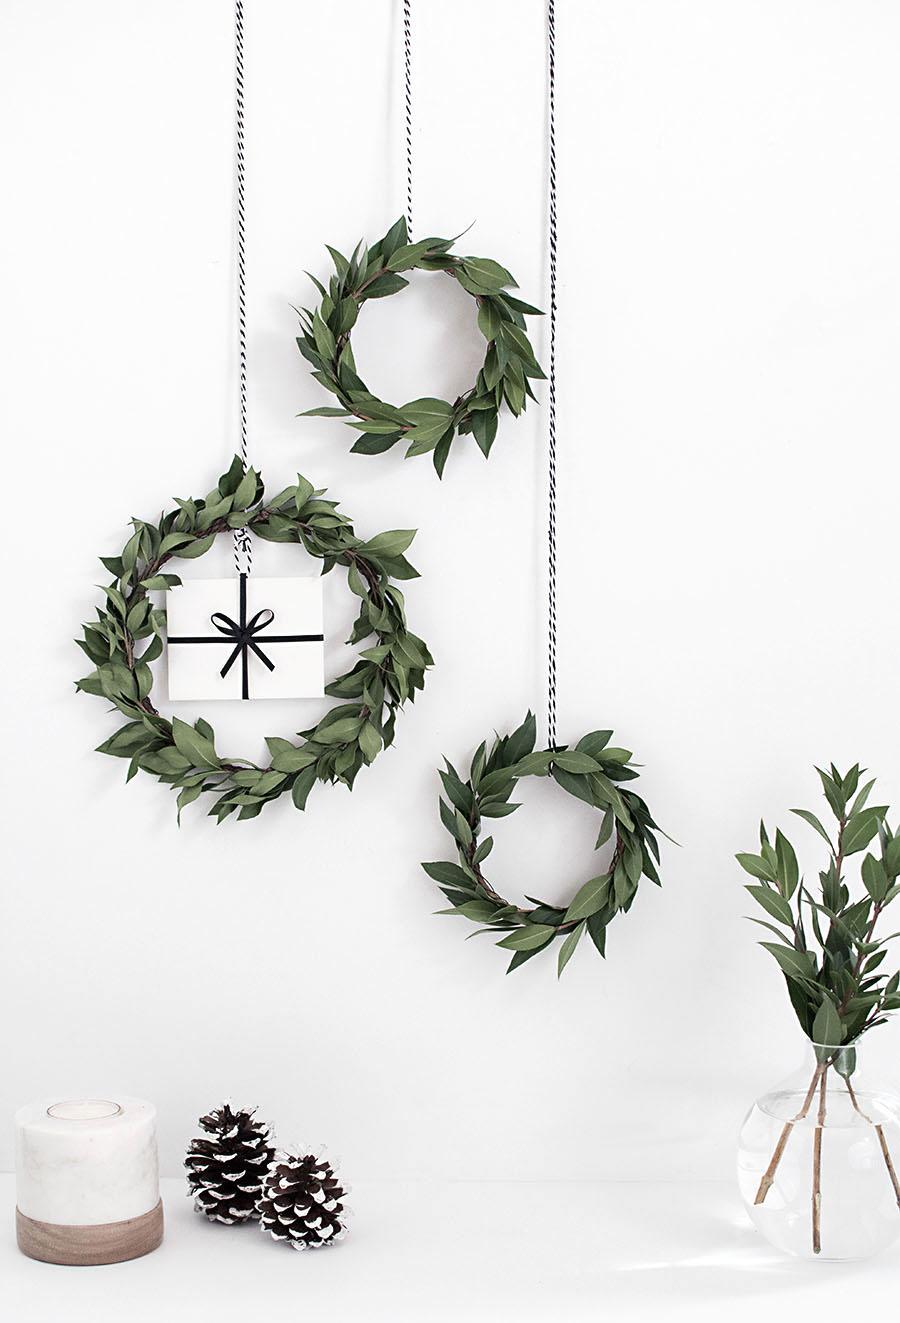 Hanging mini wreath